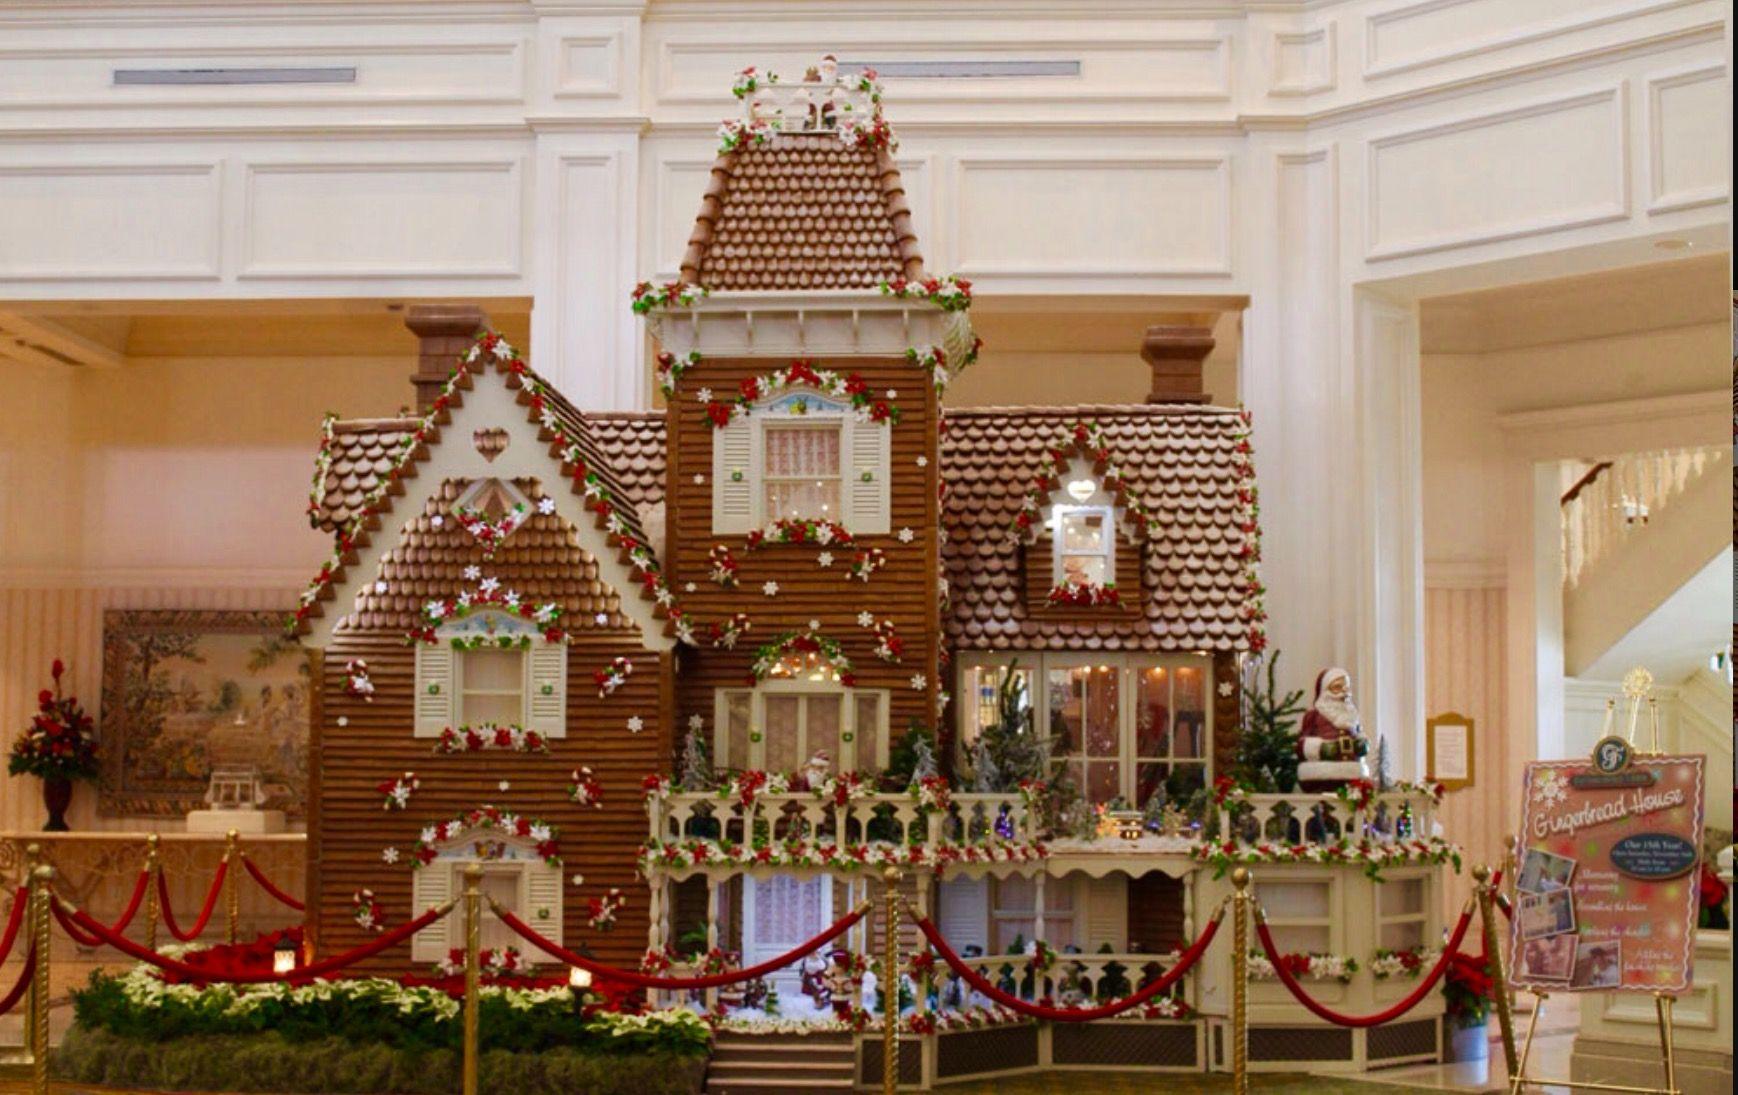 The Grand Floridian Walt Disney World Gingerbread Time